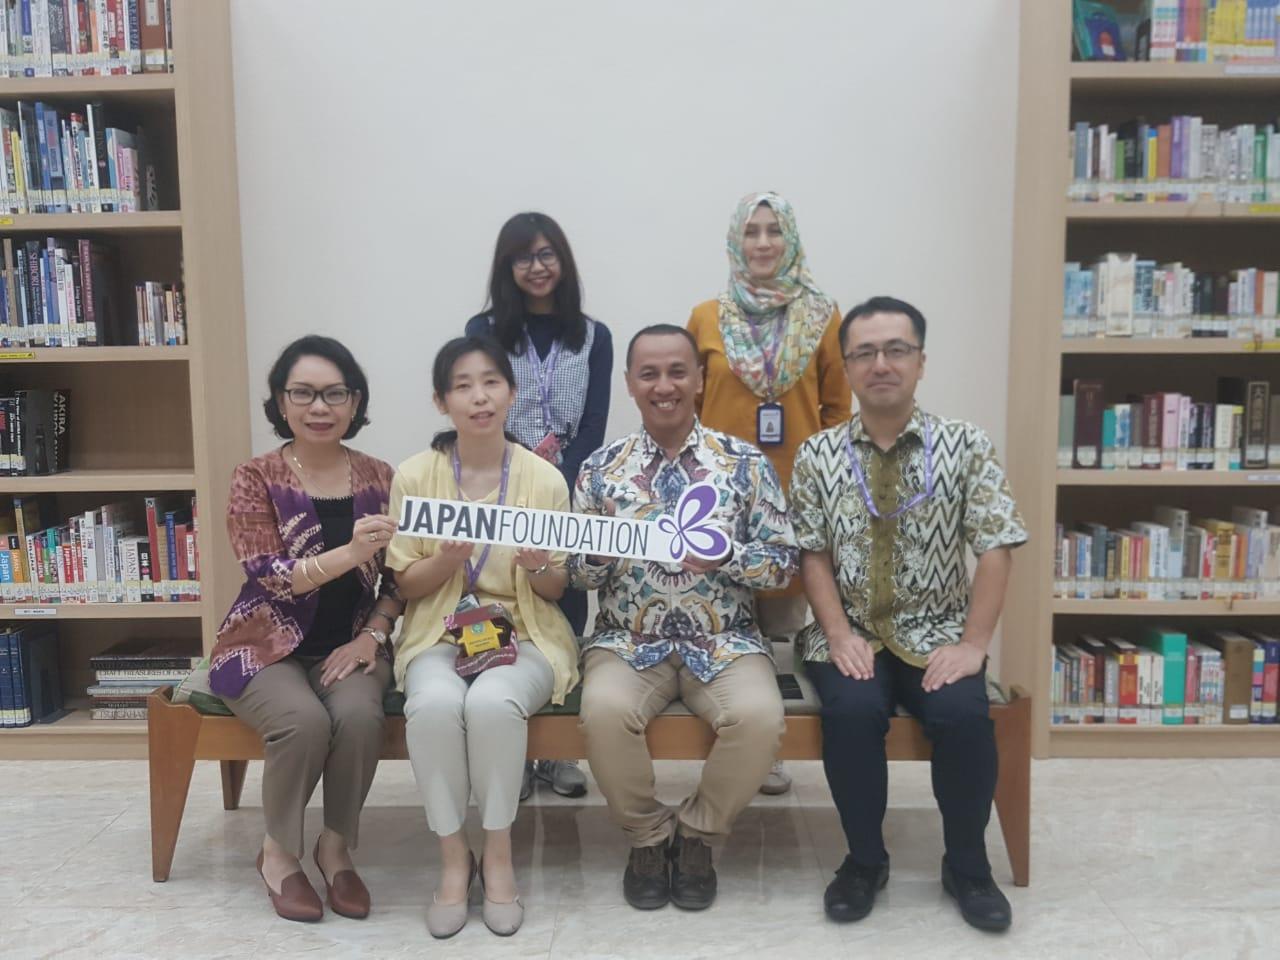 UNISM Jalin Kerjasama dengan Japan Foundation